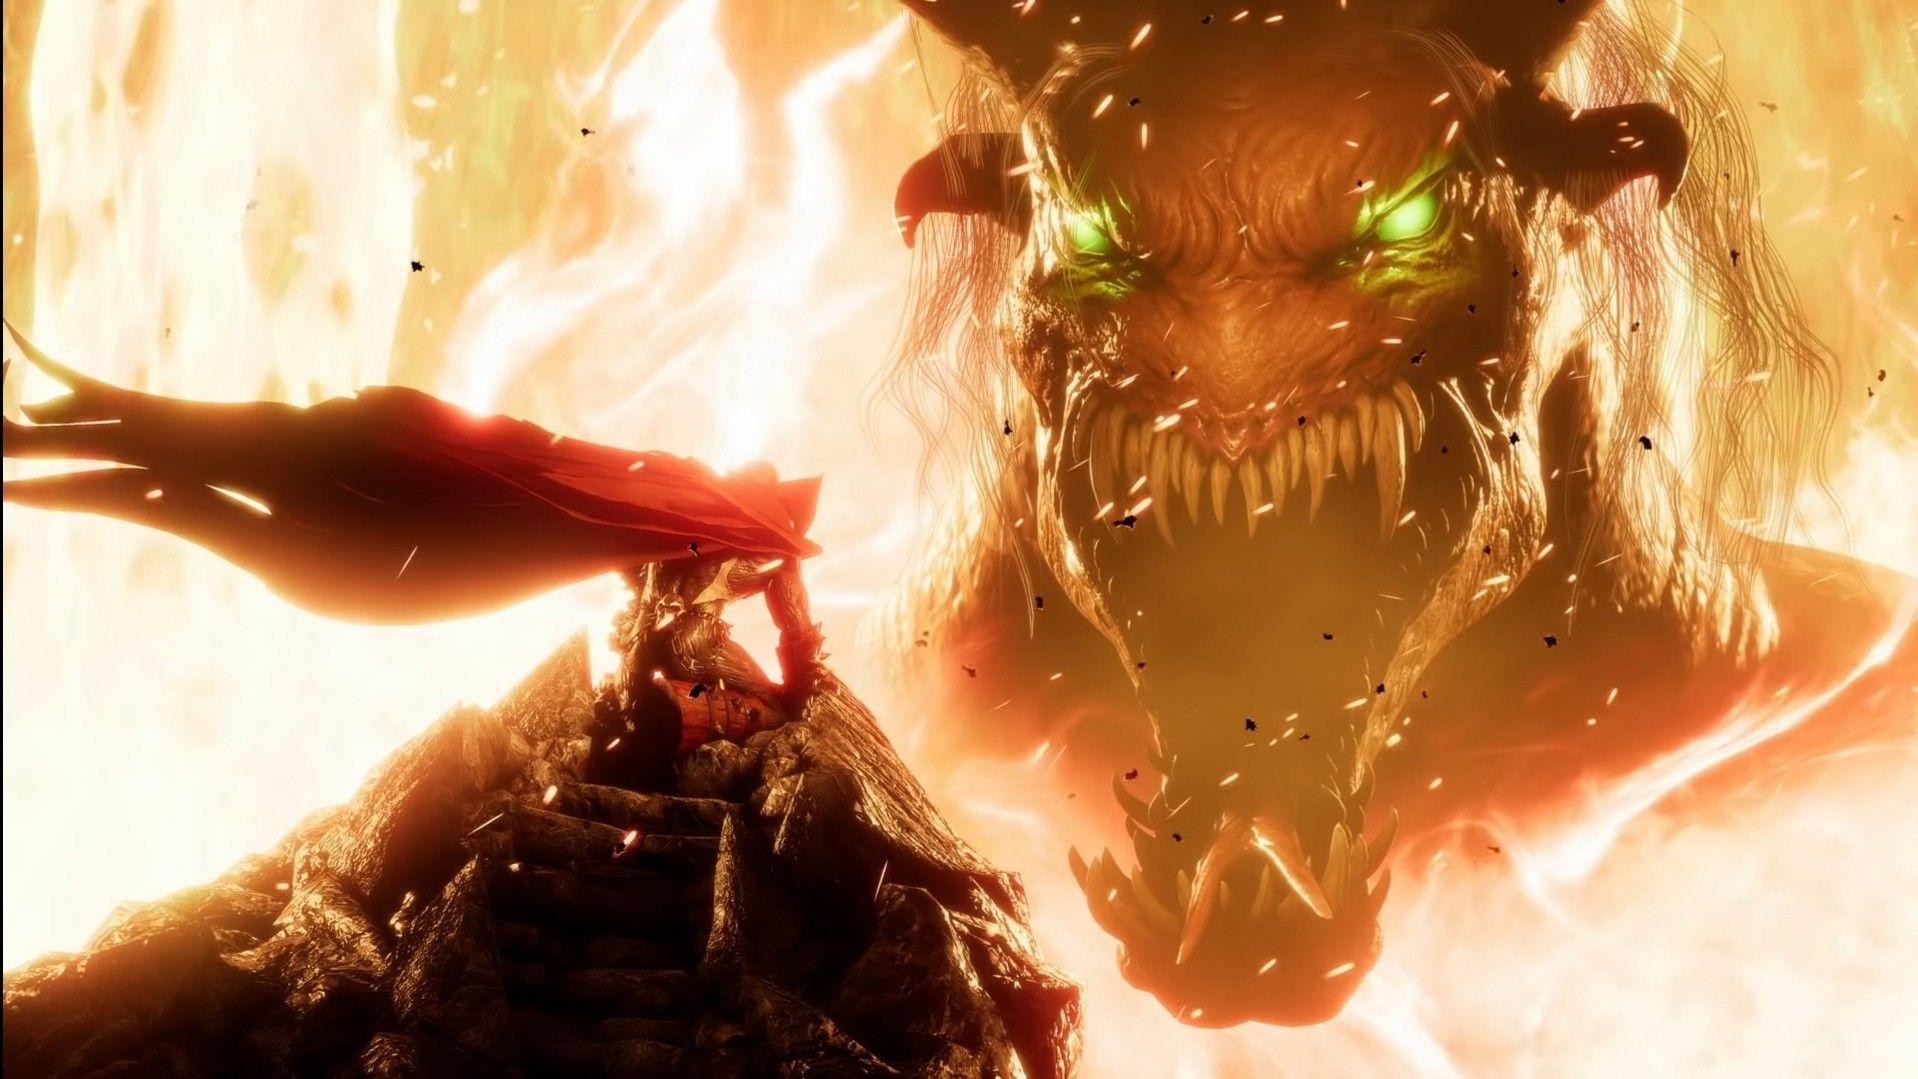 Pin By Tonny On Mortal Kombat In 2020 Mortal Kombat Victory Pose Spawn